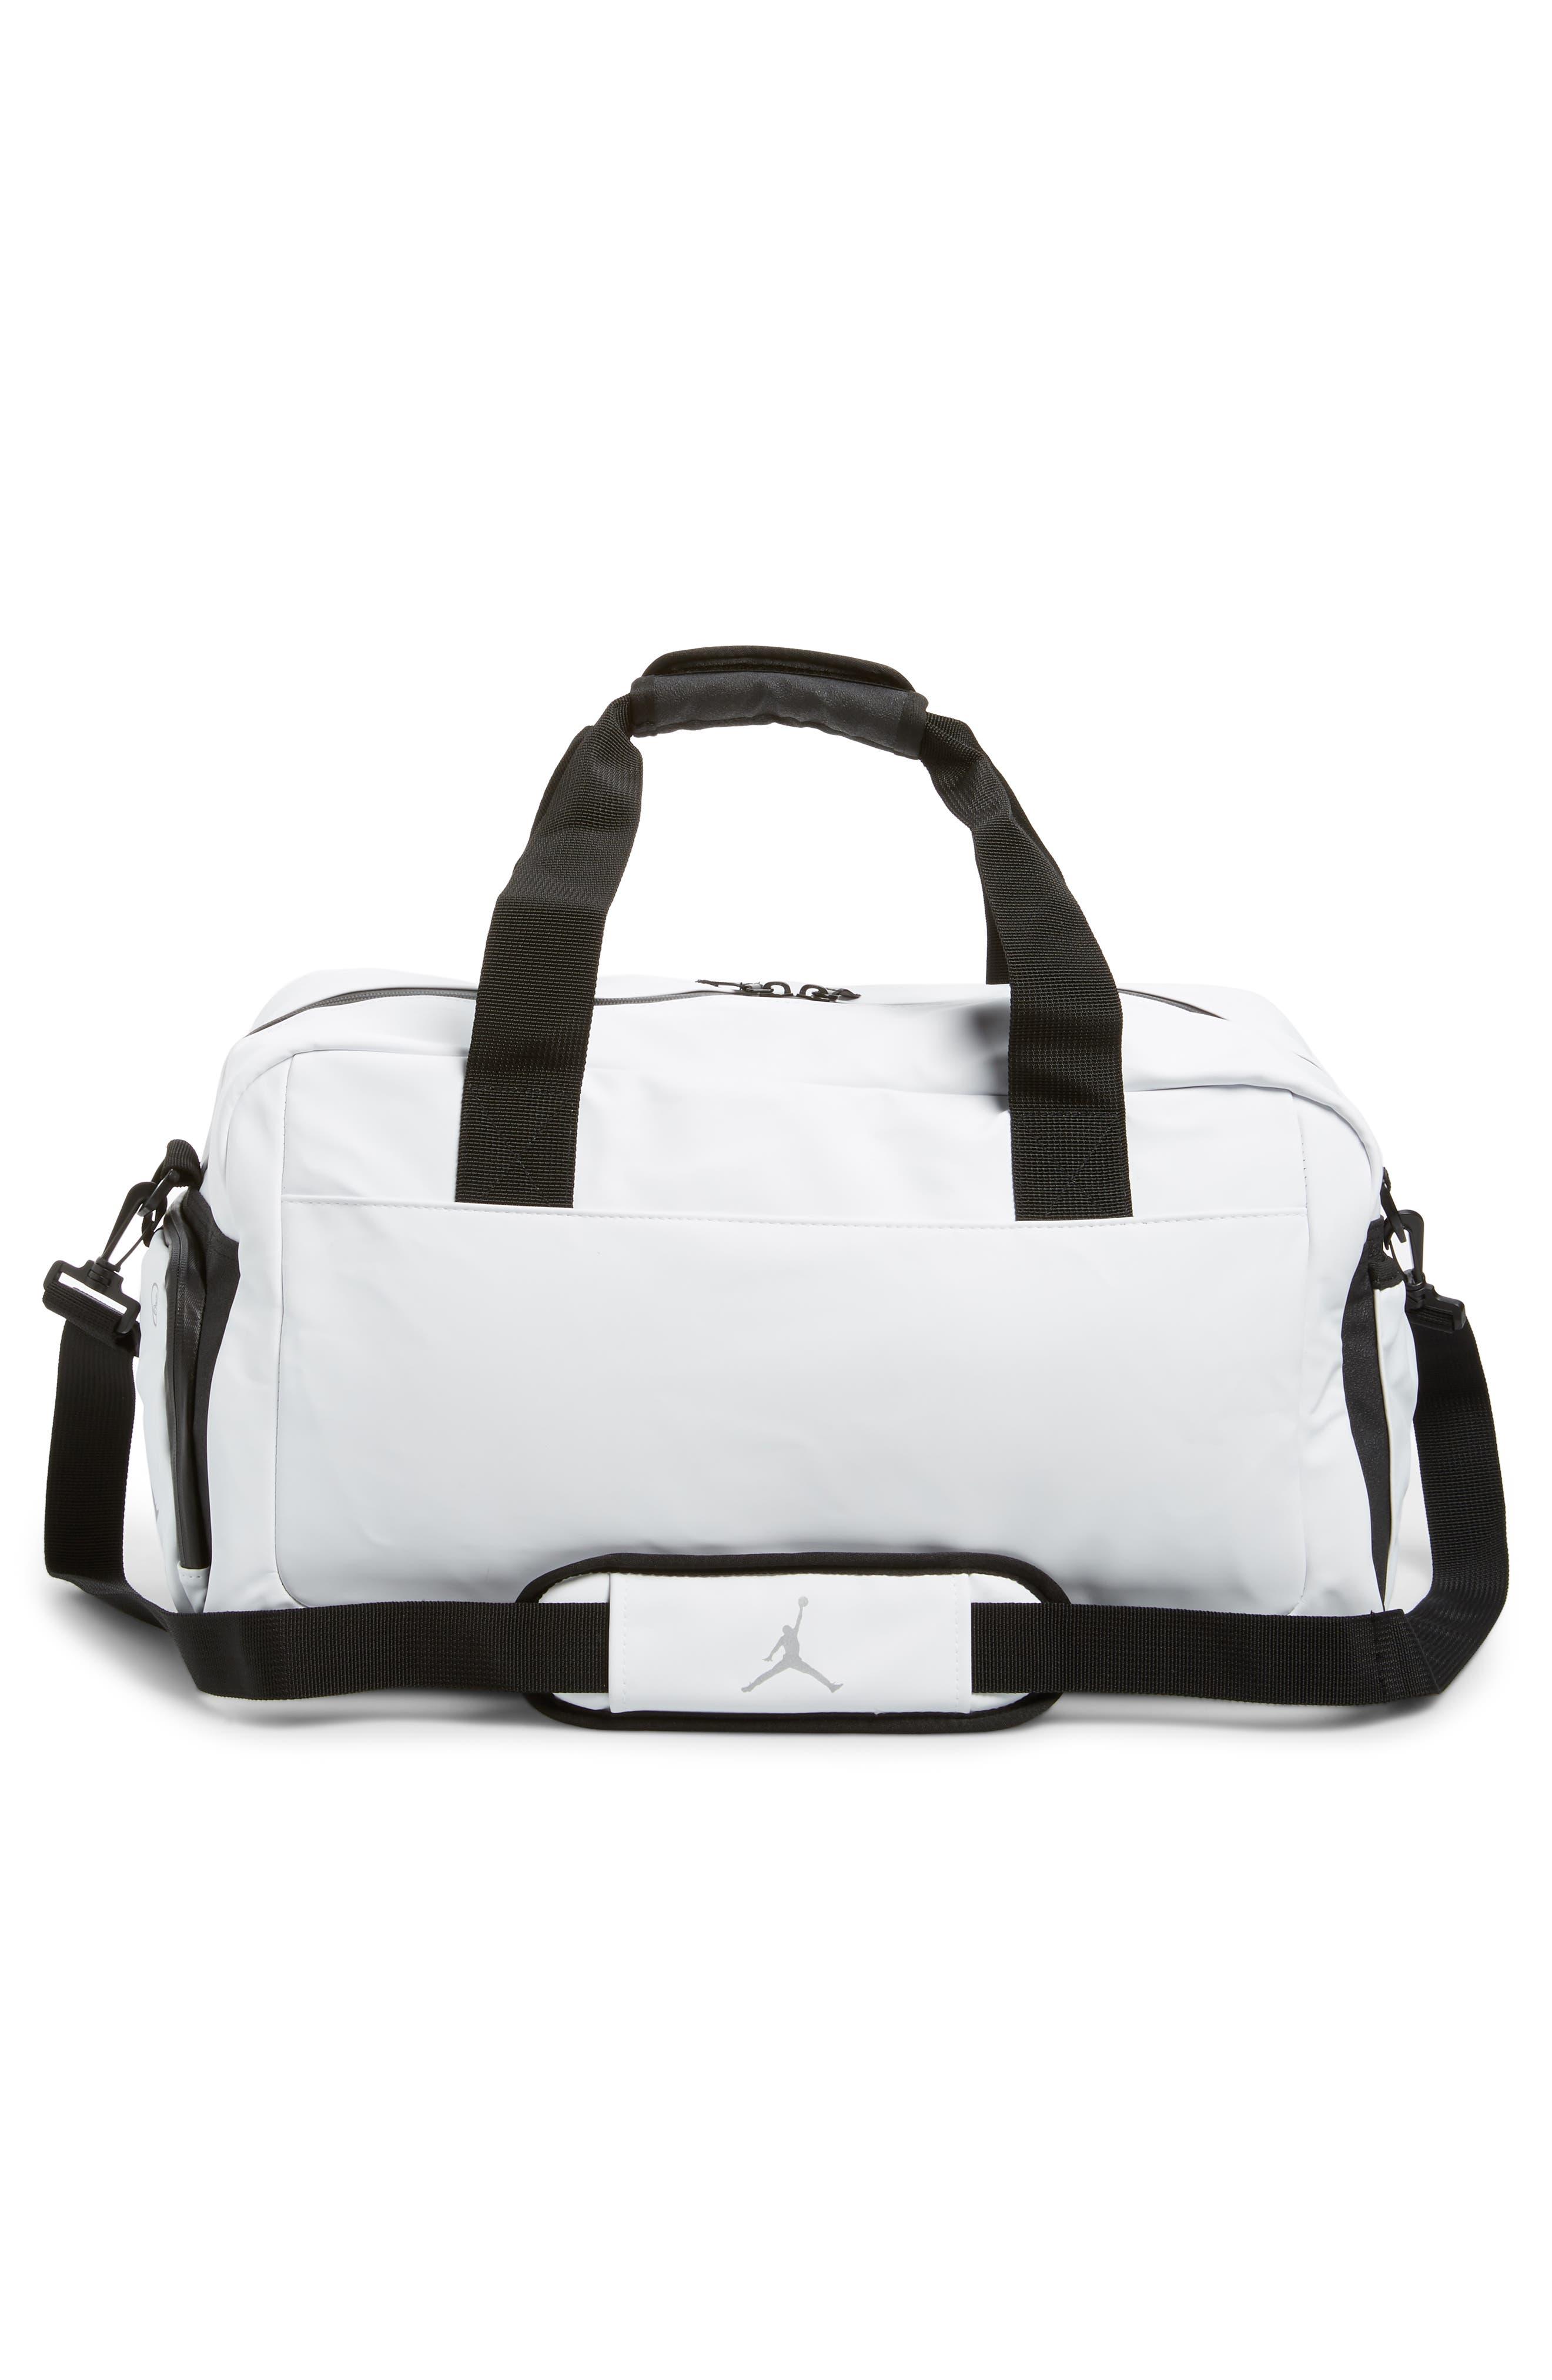 Jordan All World Edition Duffel Bag,                             Alternate thumbnail 2, color,                             100